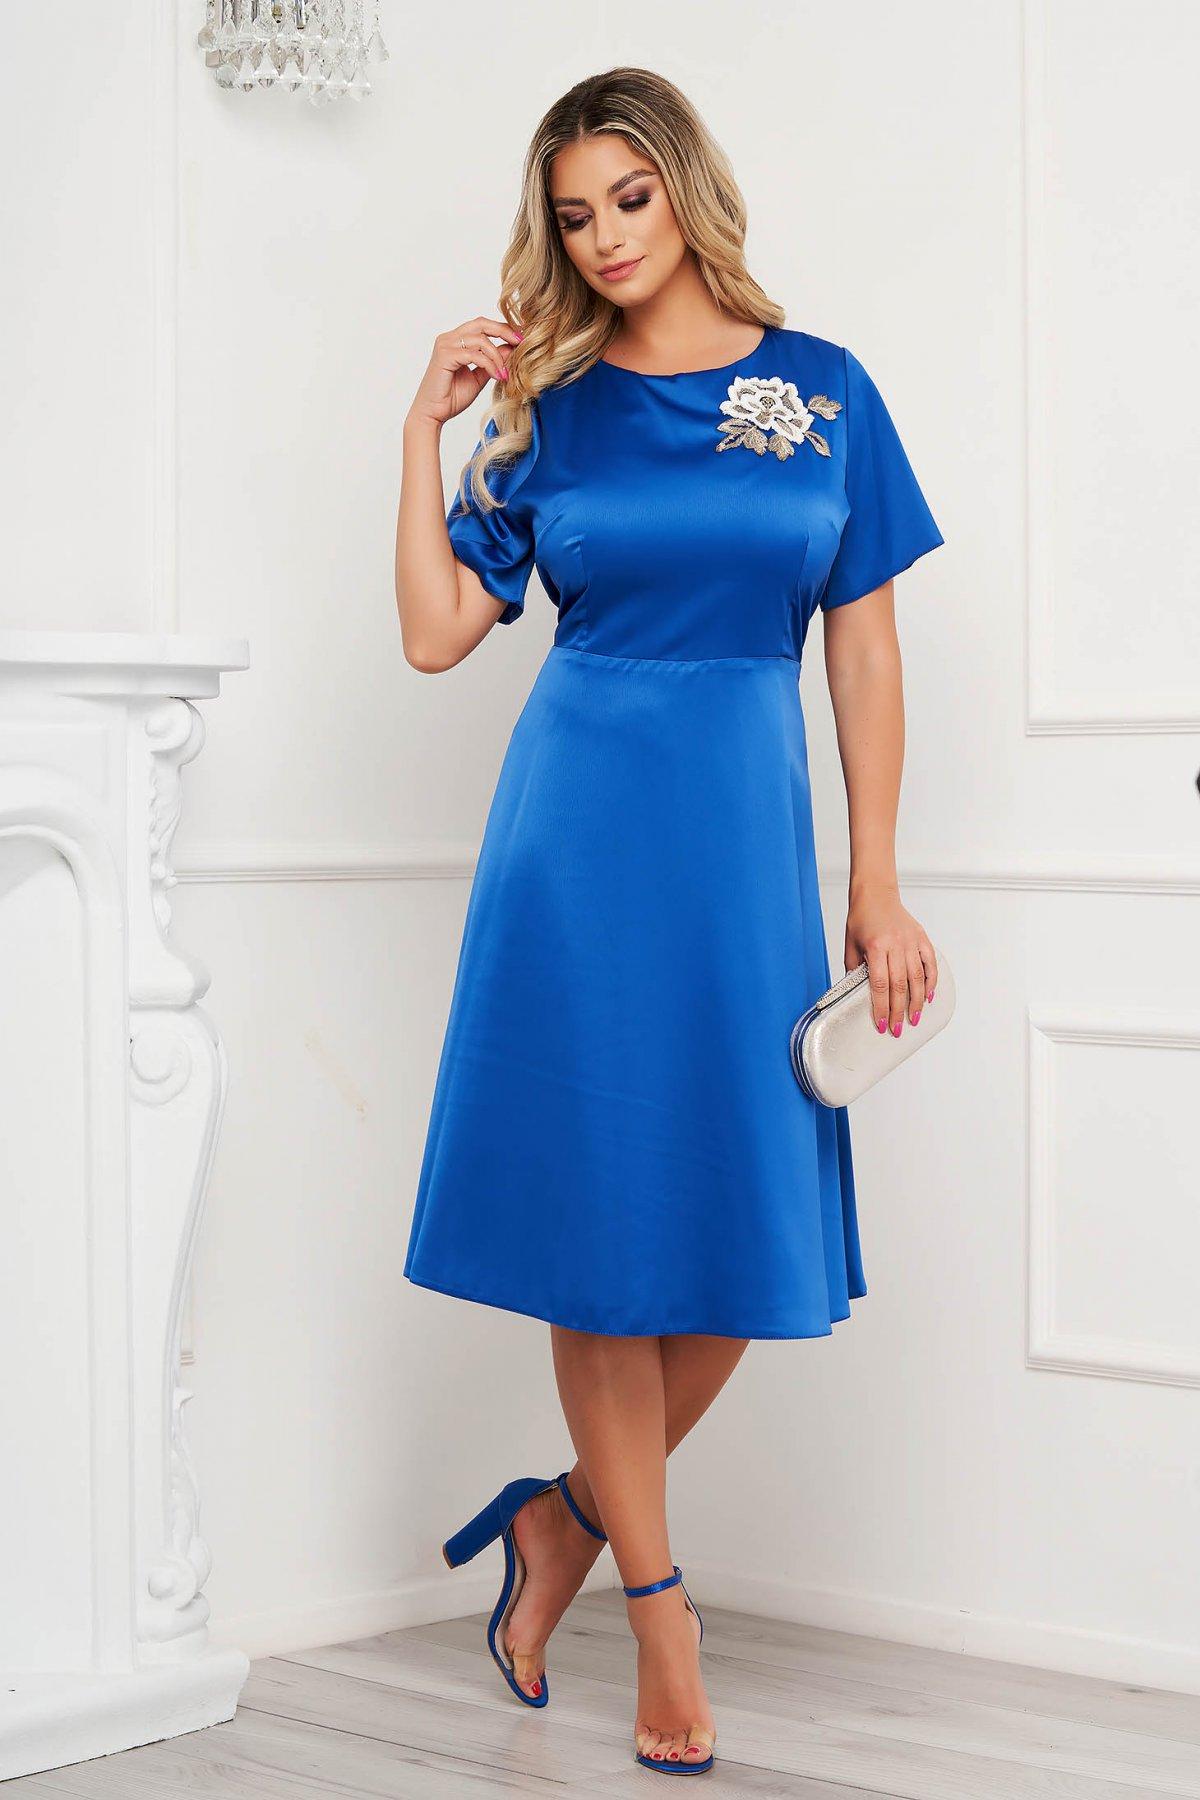 Rochie Lady Pandora albastra eleganta din material satinat cu croi in a si broderie florala - medelin.ro